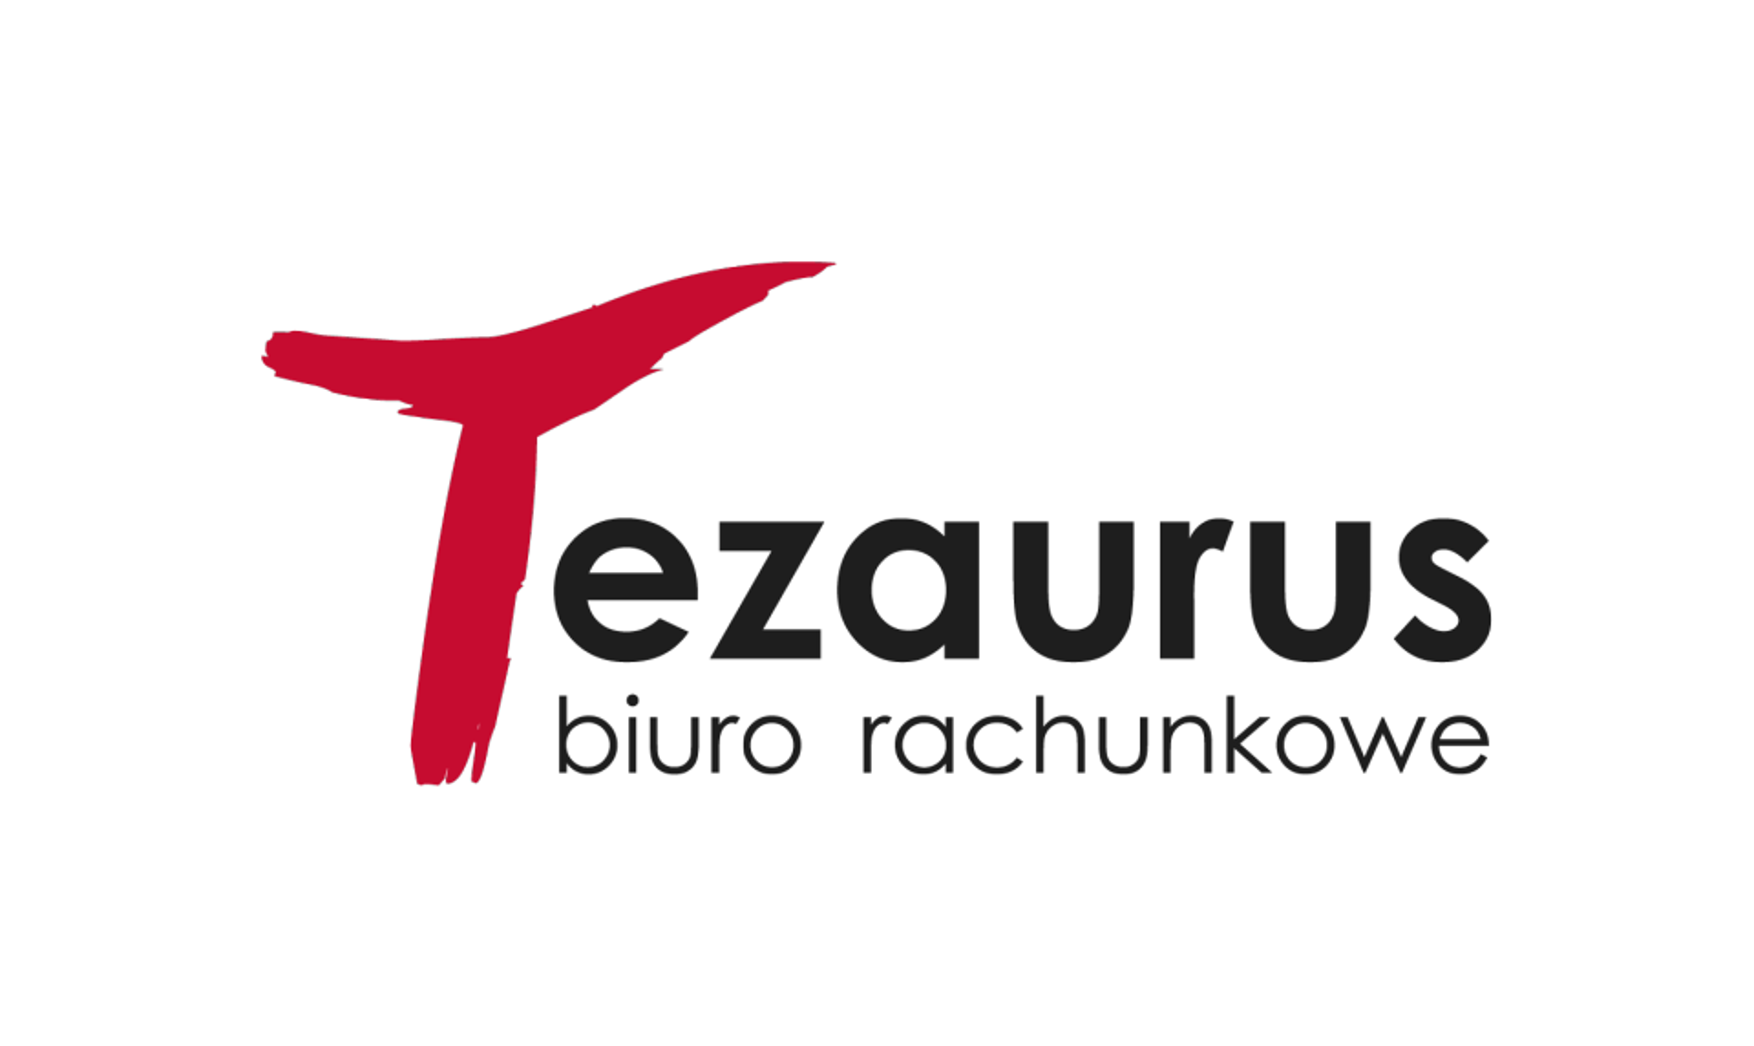 logo_Tezaurus_RGB